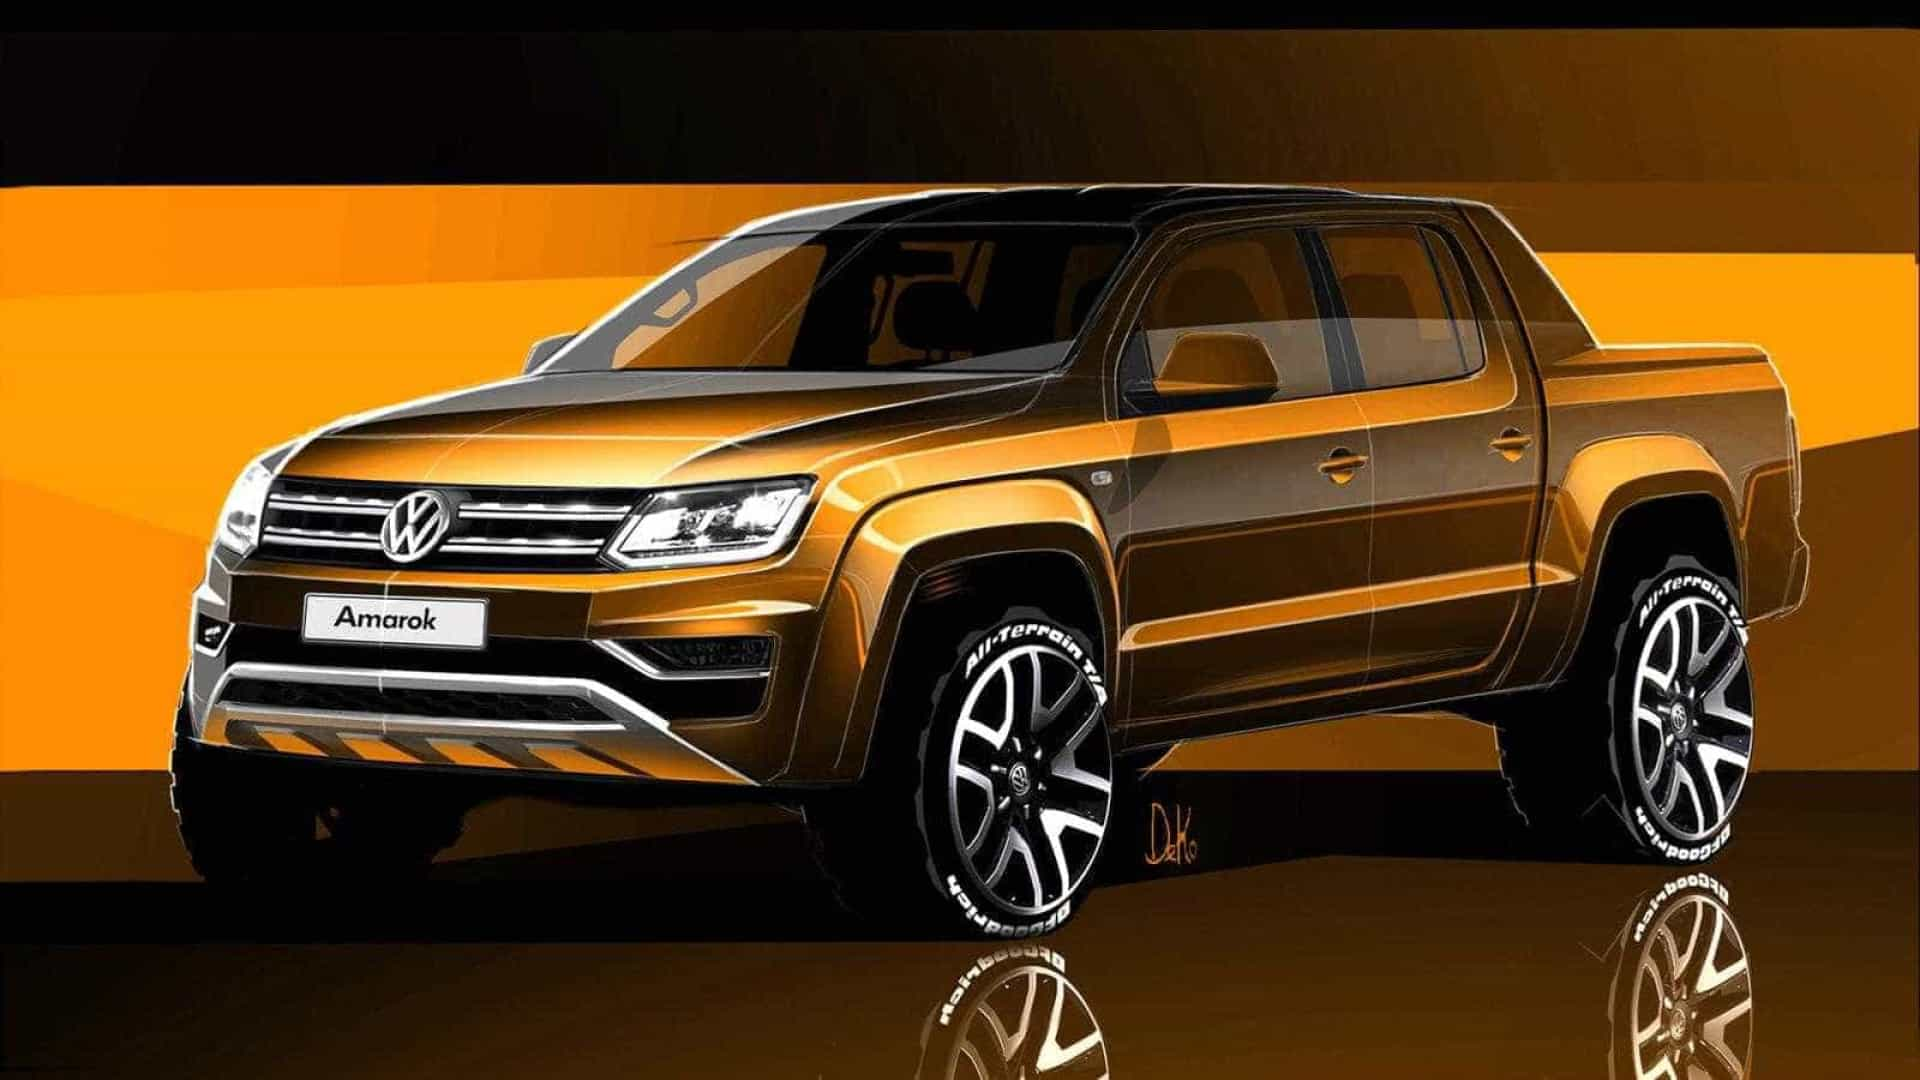 Vinte e oito Volkswagen Amarok vão reforçar segurança na costa portuguesa